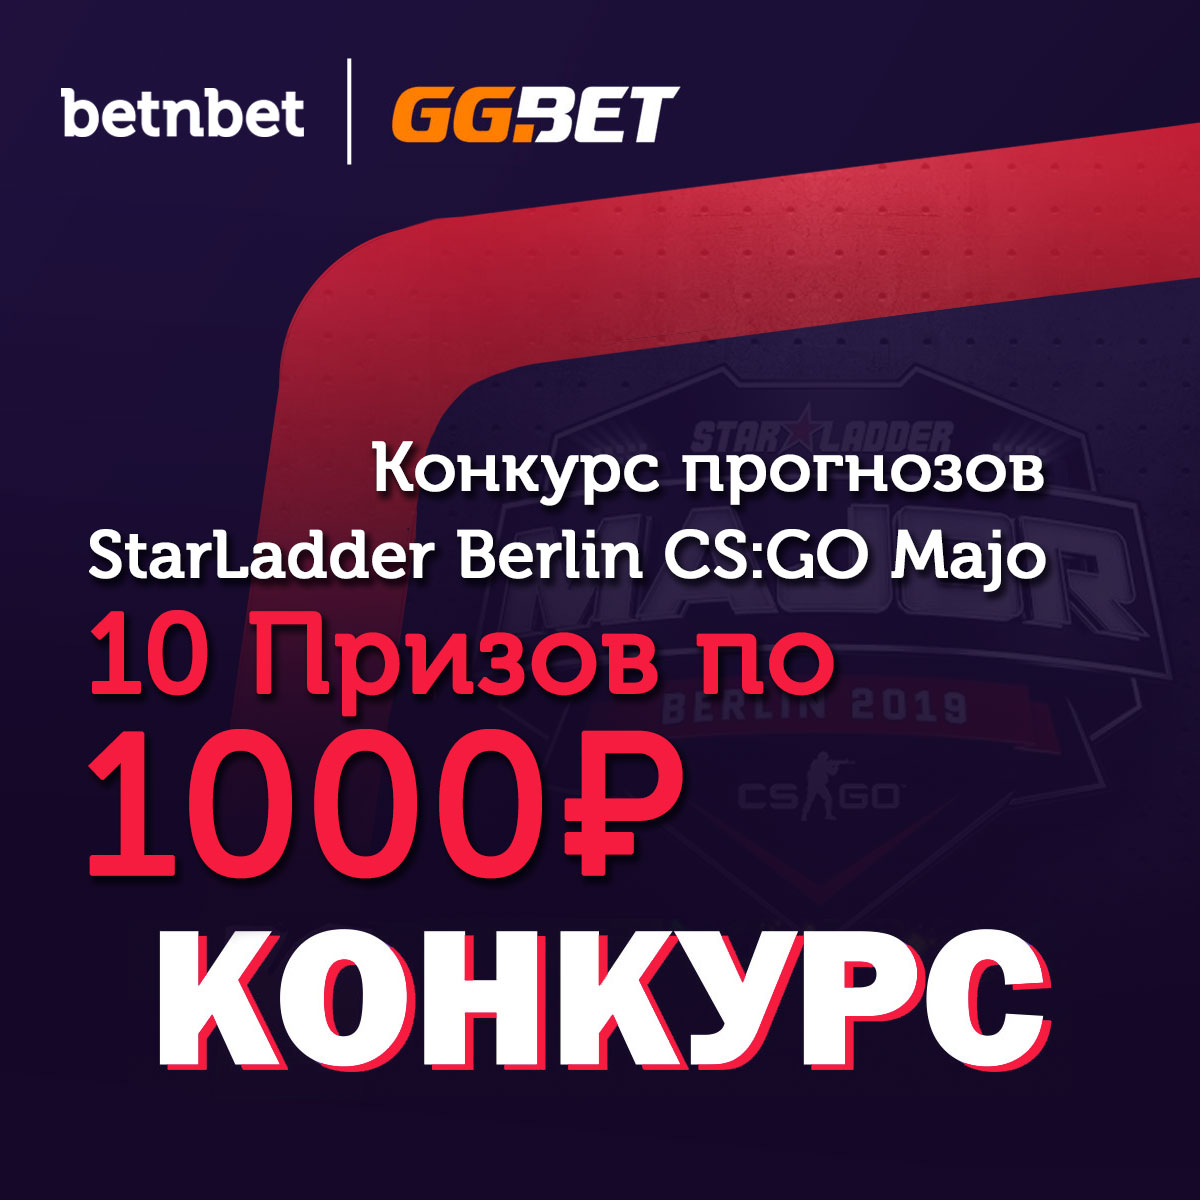 Лучший прогнозист StarLadder Berlin CS:GO Major